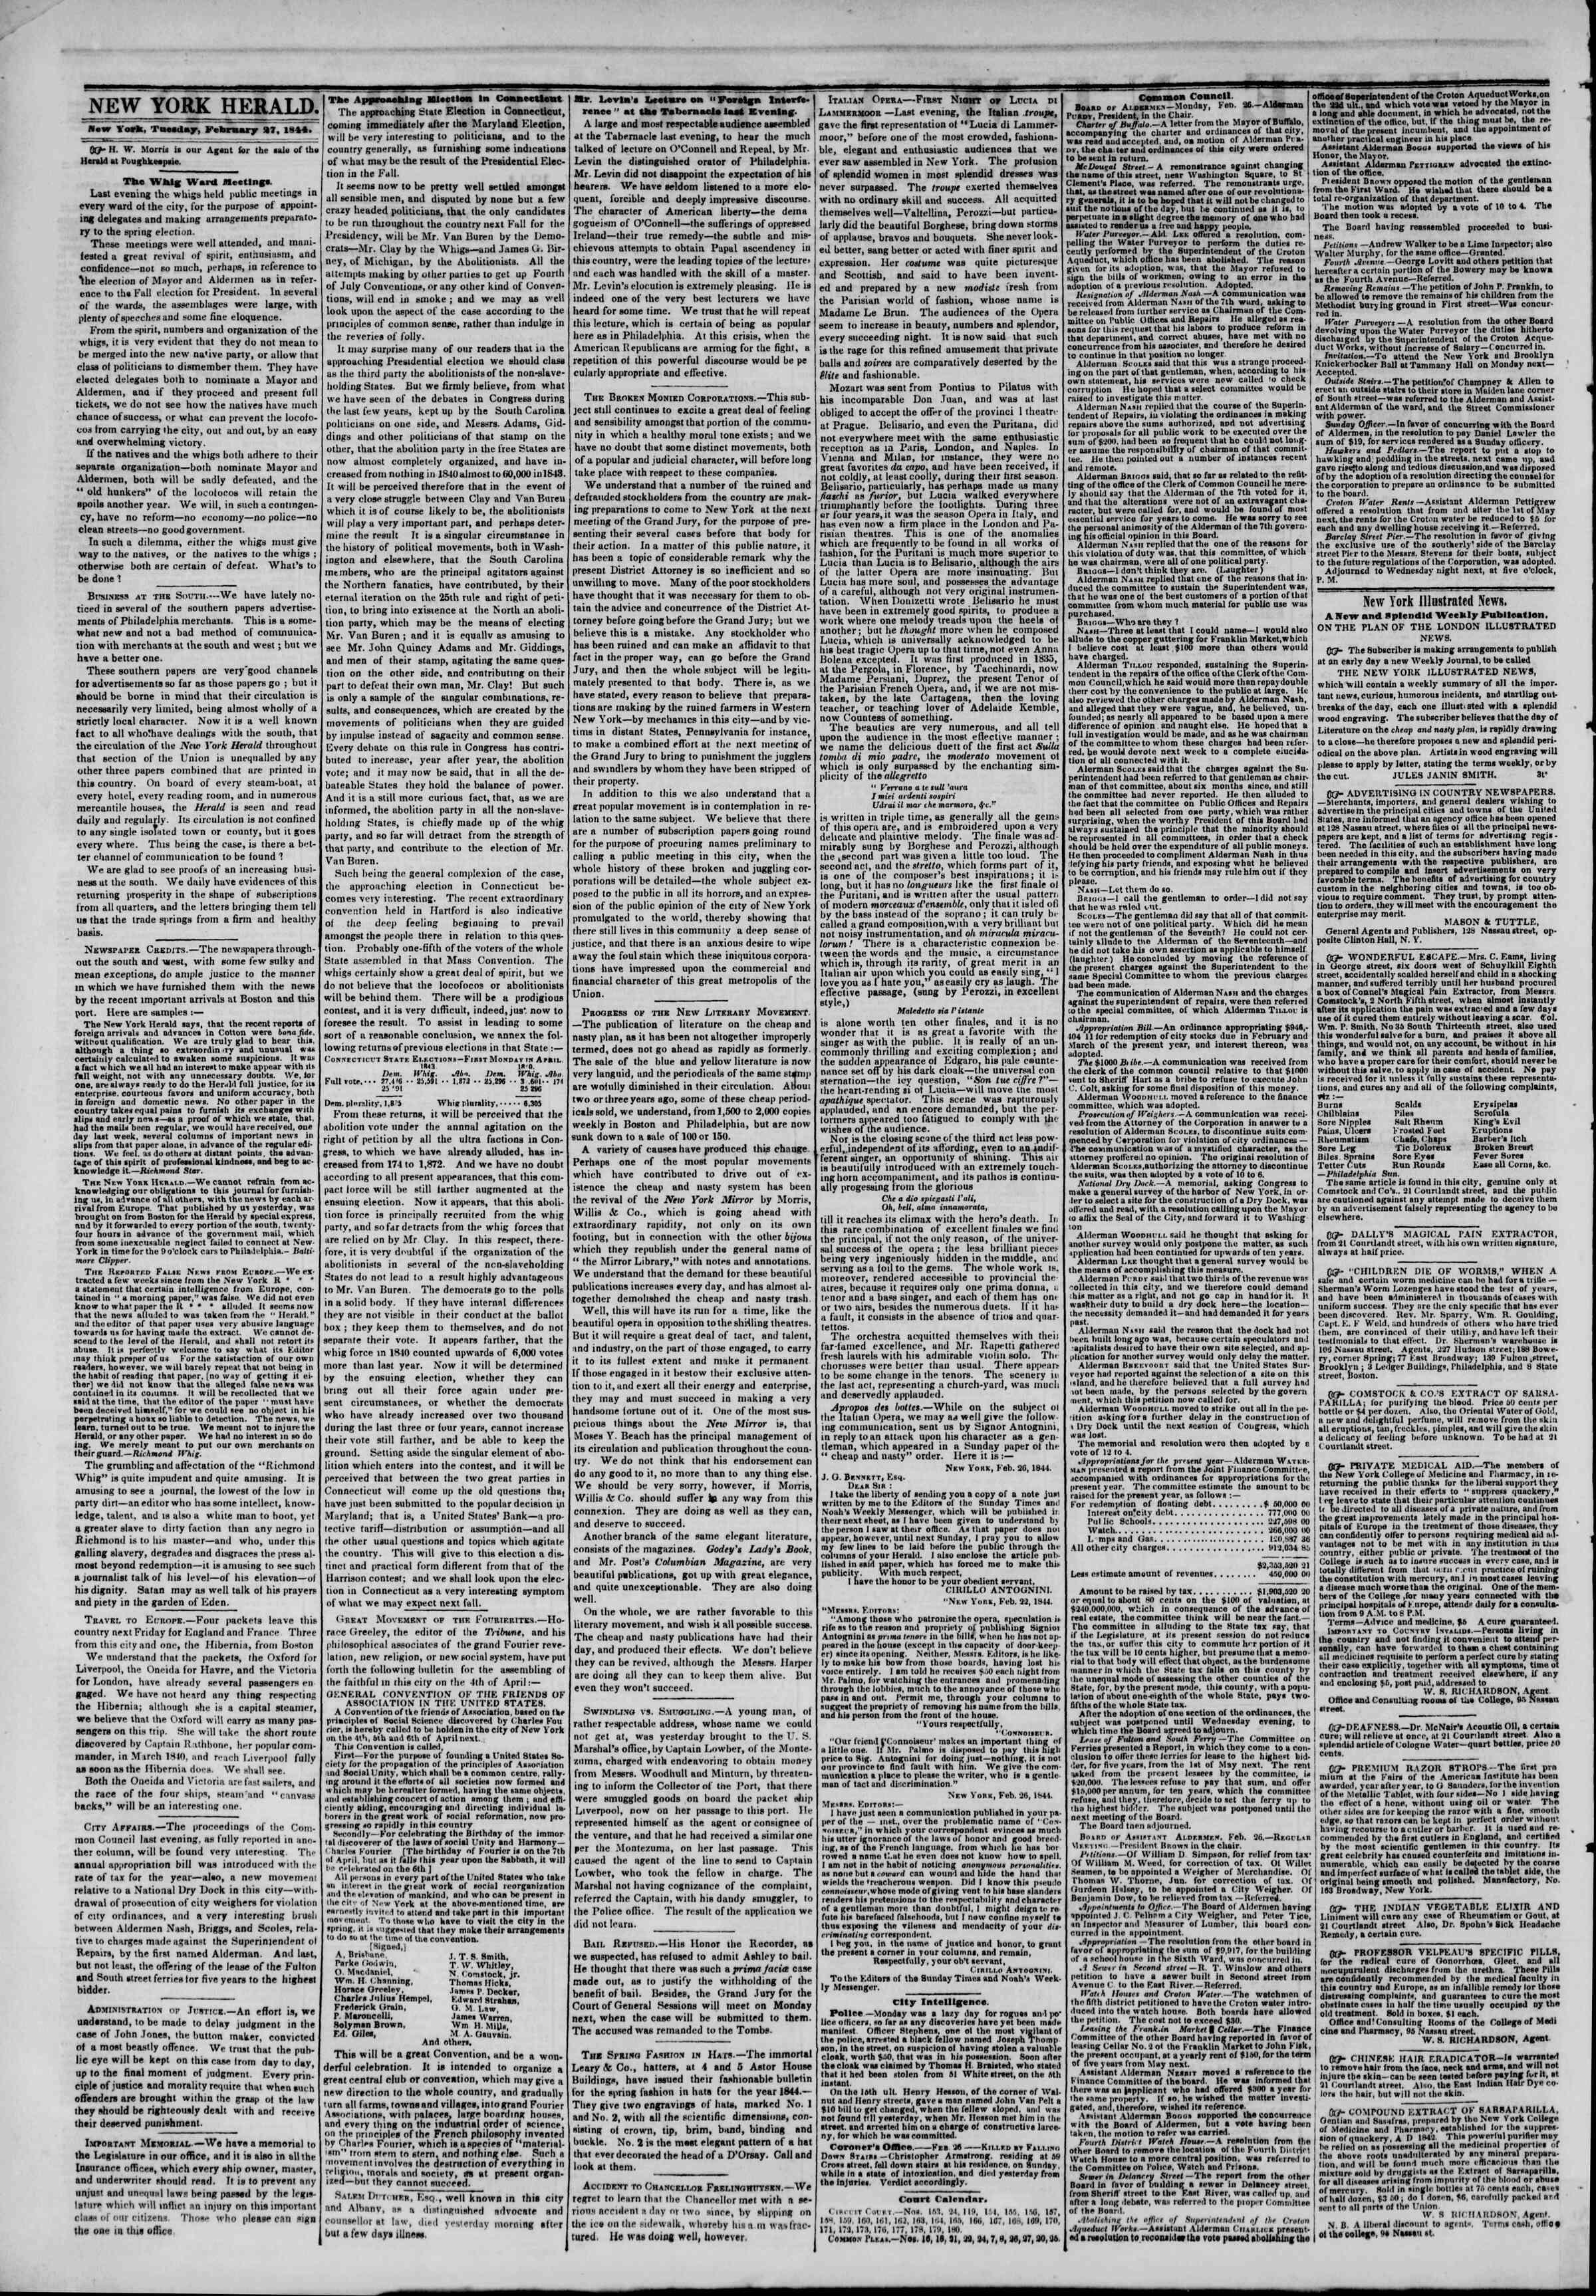 February 27, 1844 Tarihli The New York Herald Gazetesi Sayfa 2